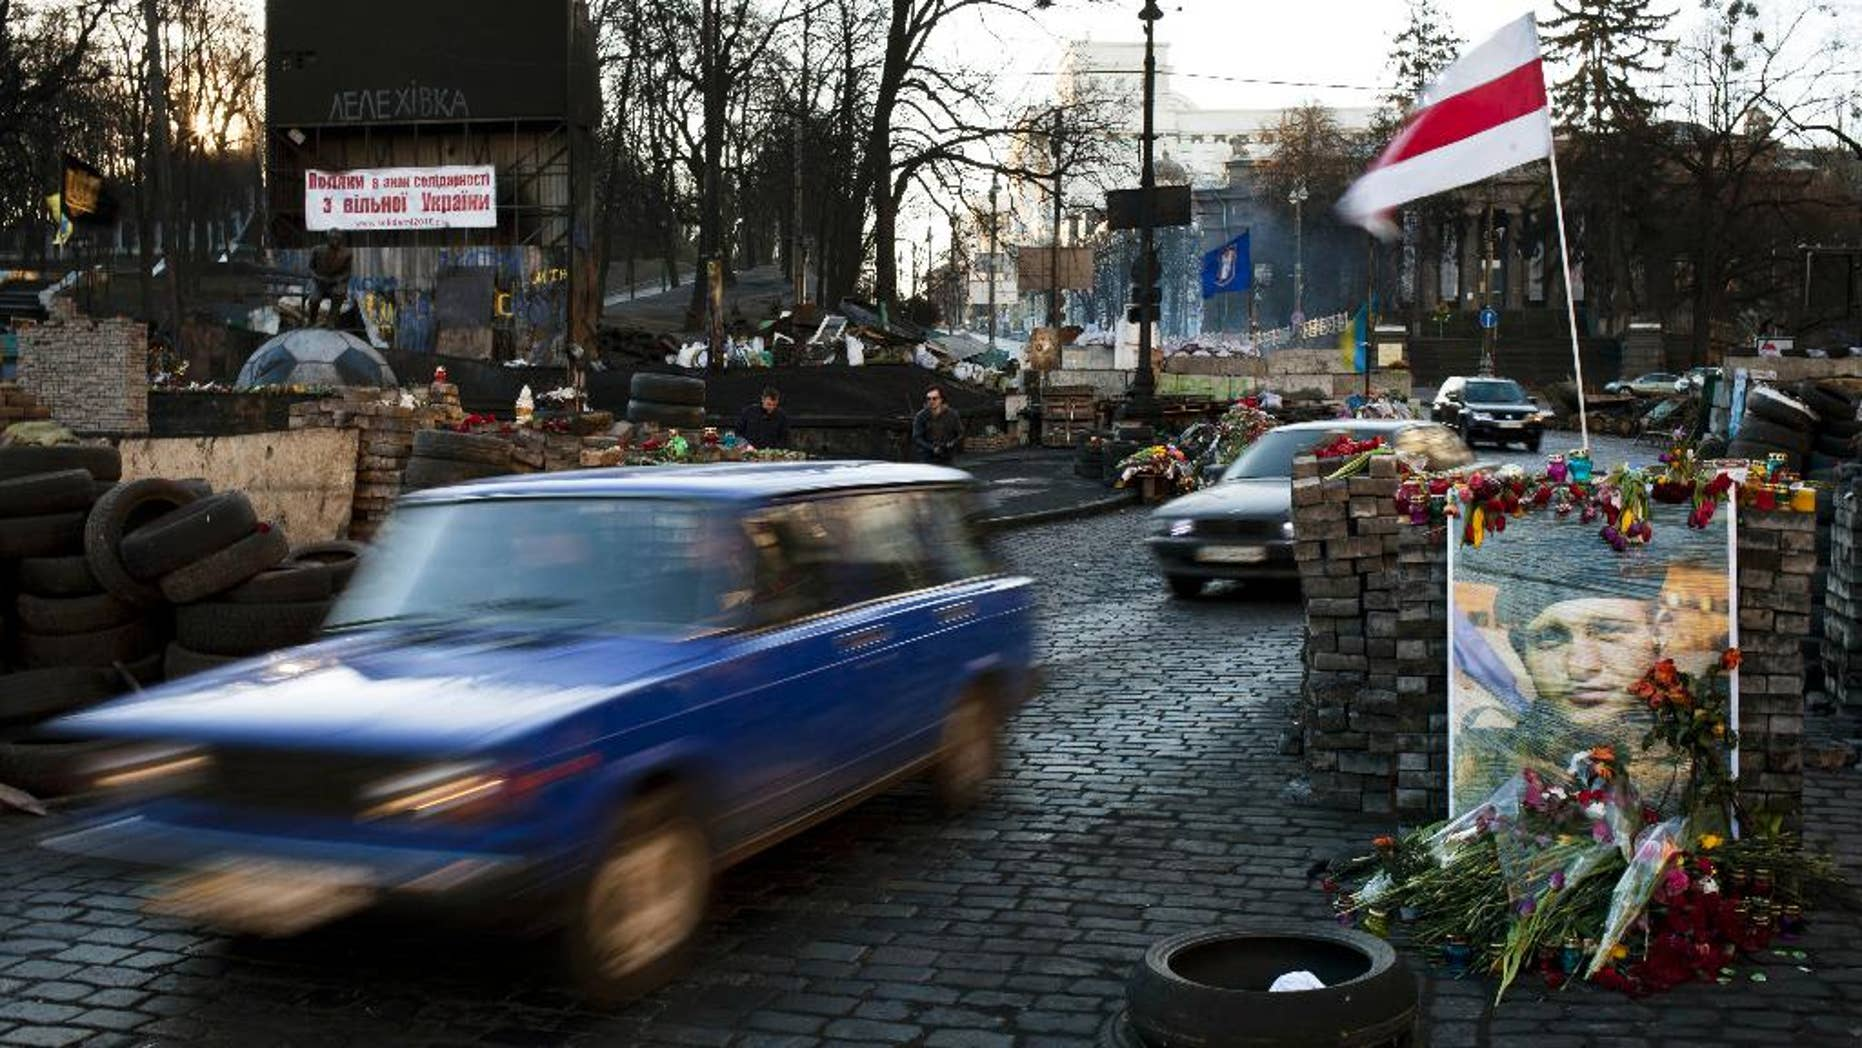 Cars make their way past barricades placed on a road near the Dynamo Kyiv soccer club stadium in Kiev, Ukraine, Wednesday, March 12, 2014. (AP Photo/David Azia)